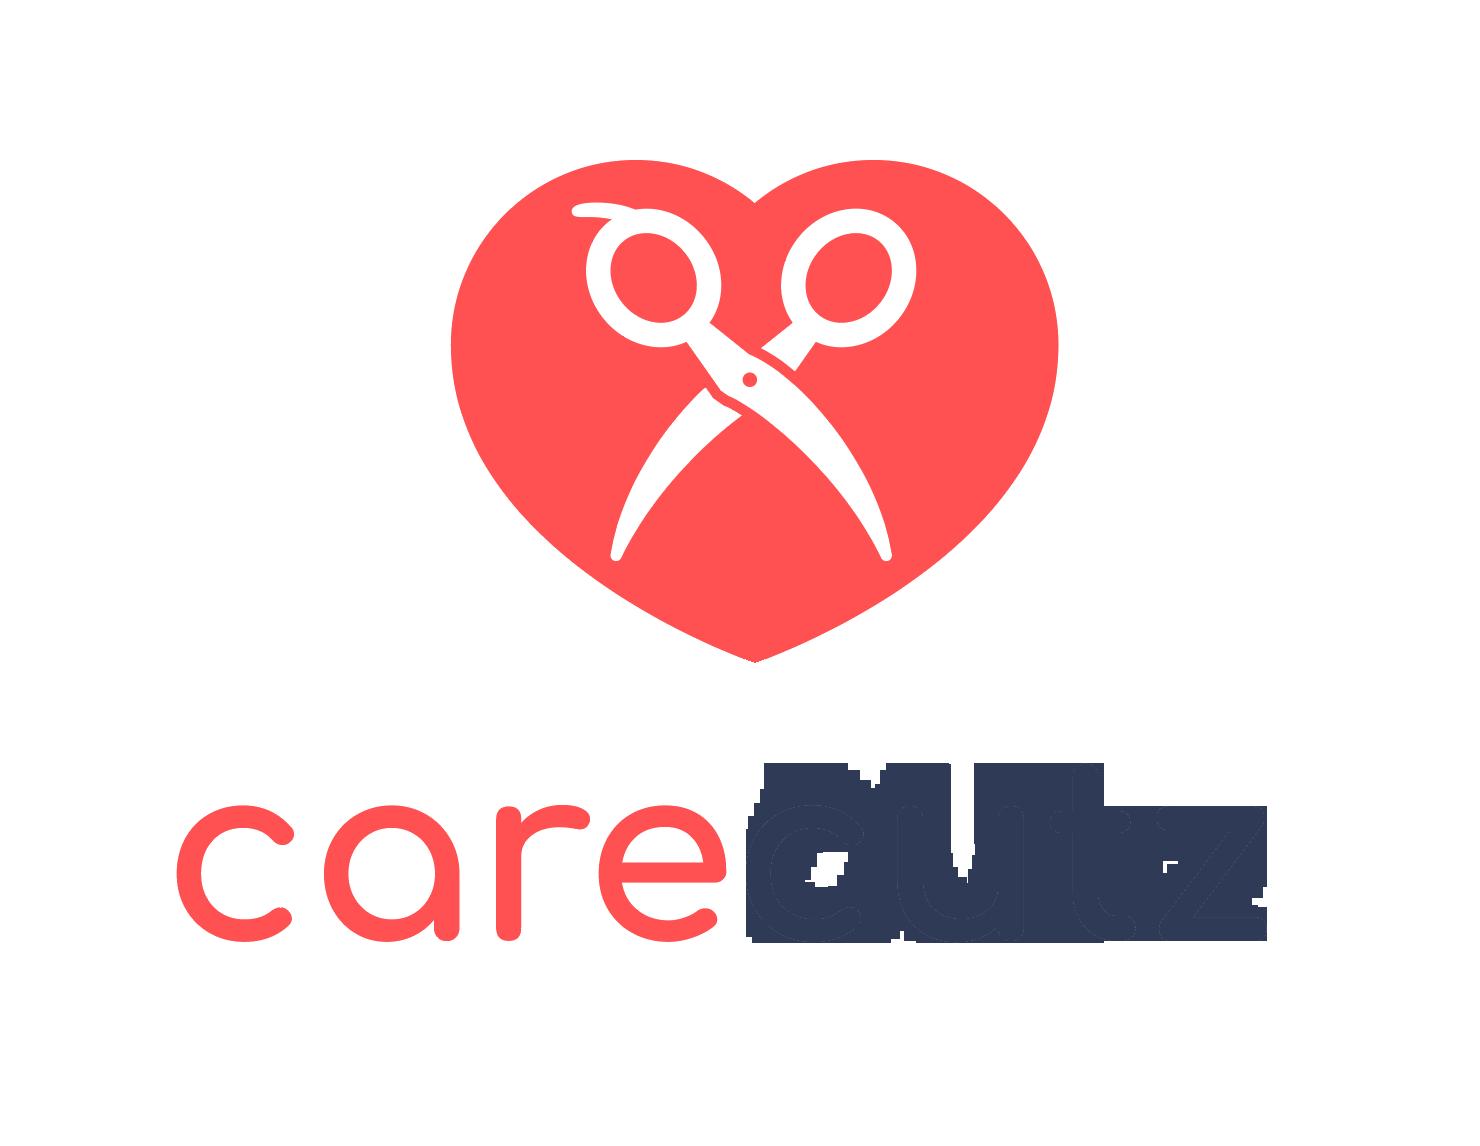 carecutz 2018 logo final 1.png